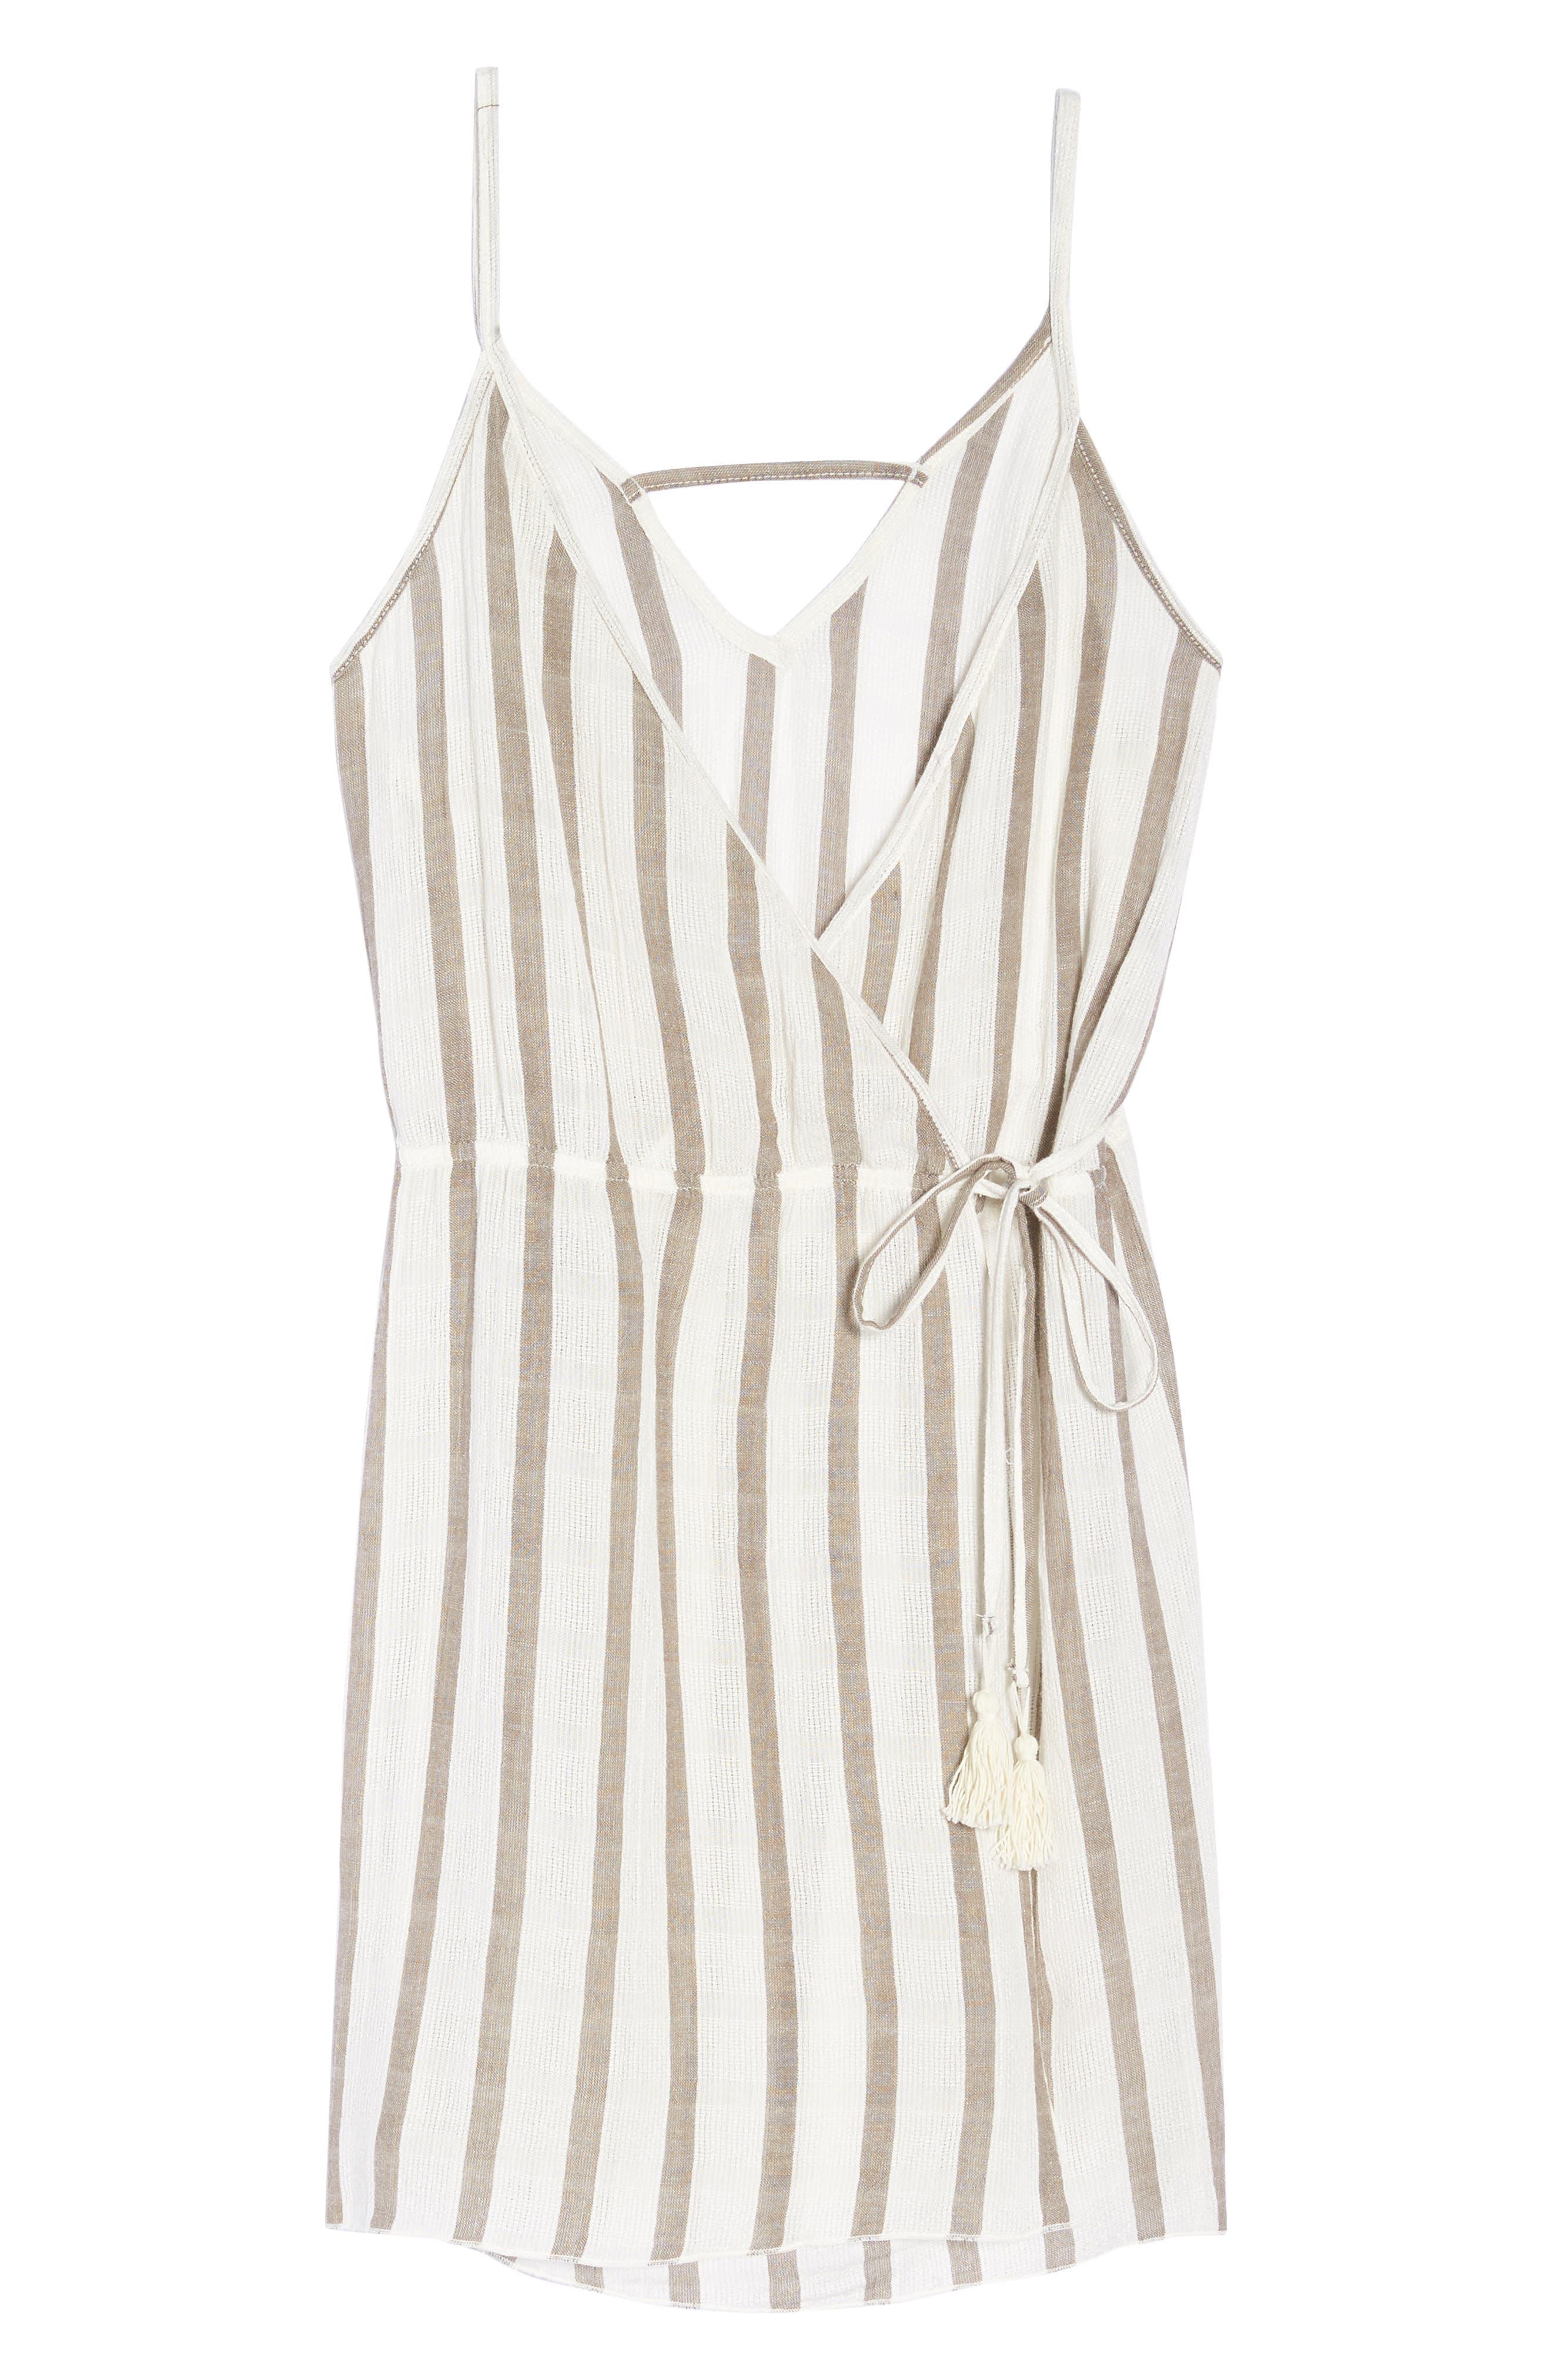 Serengeti Cover-Up Wrap Dress,                             Alternate thumbnail 6, color,                             NATURAL